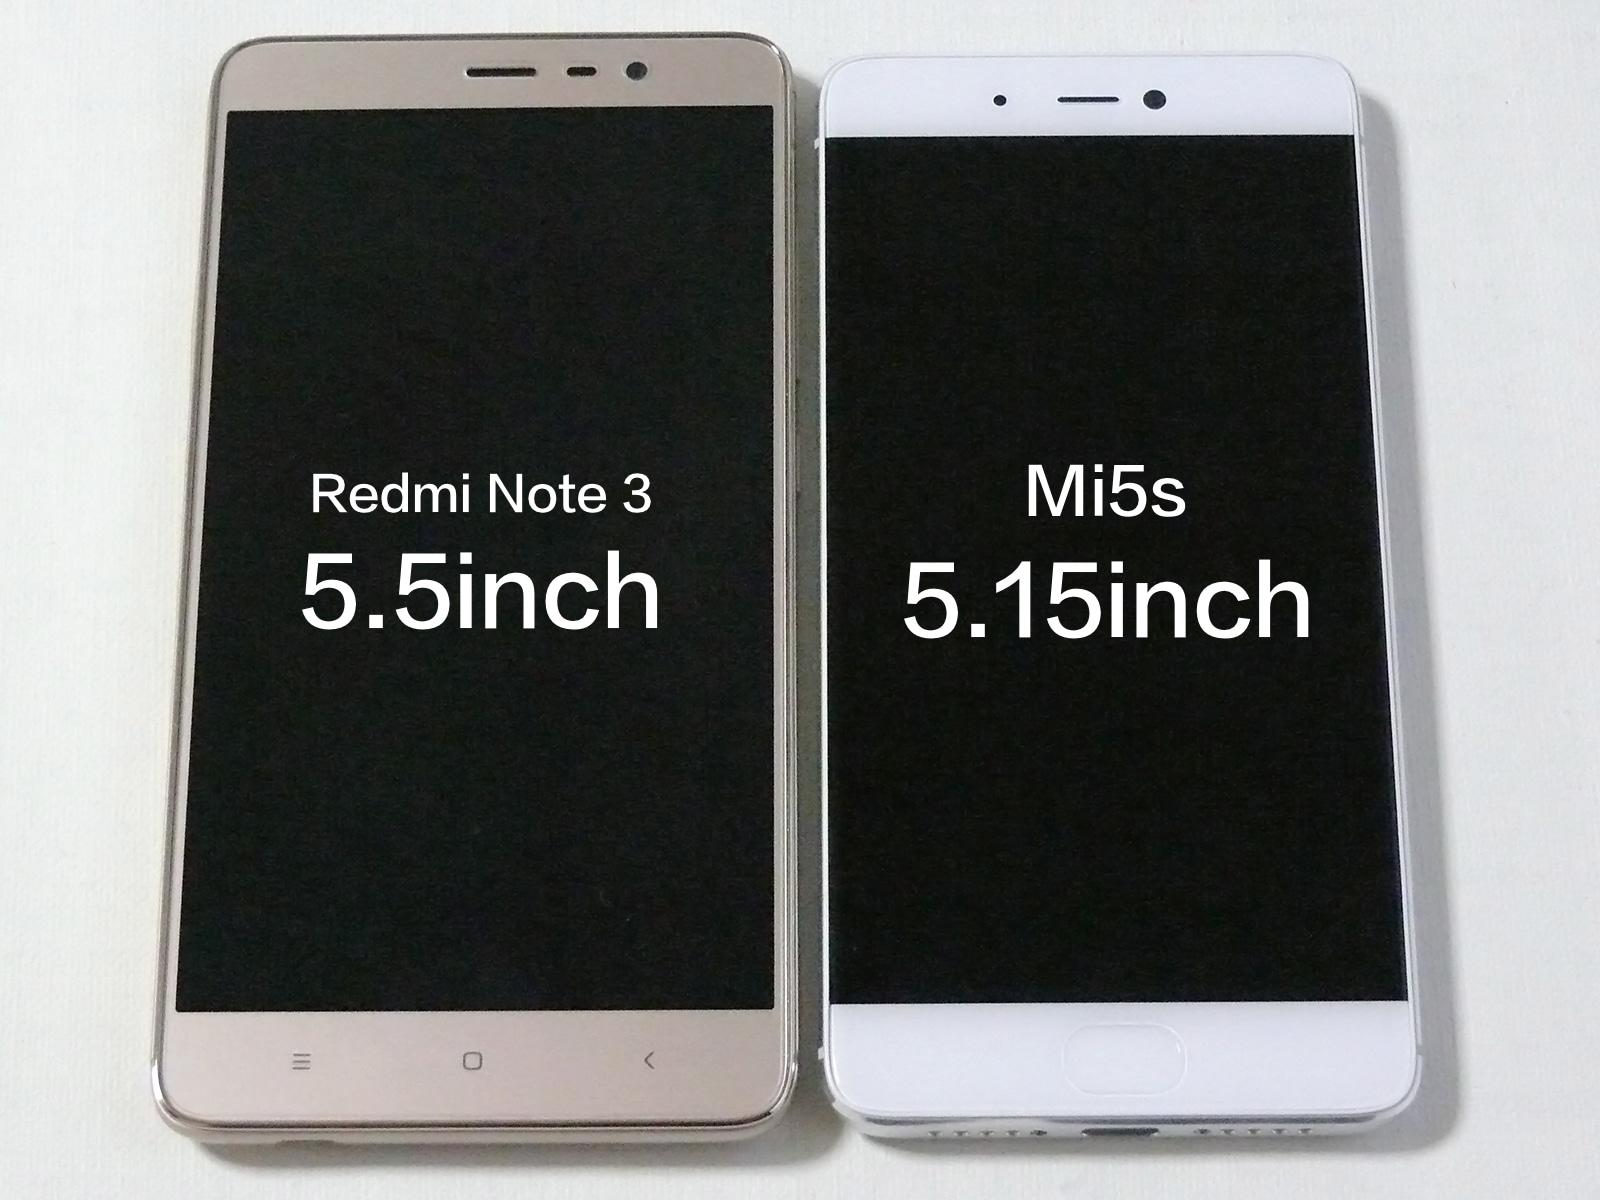 Xiaomi MI5sとRedmi Note 3 Proのサイズ比較